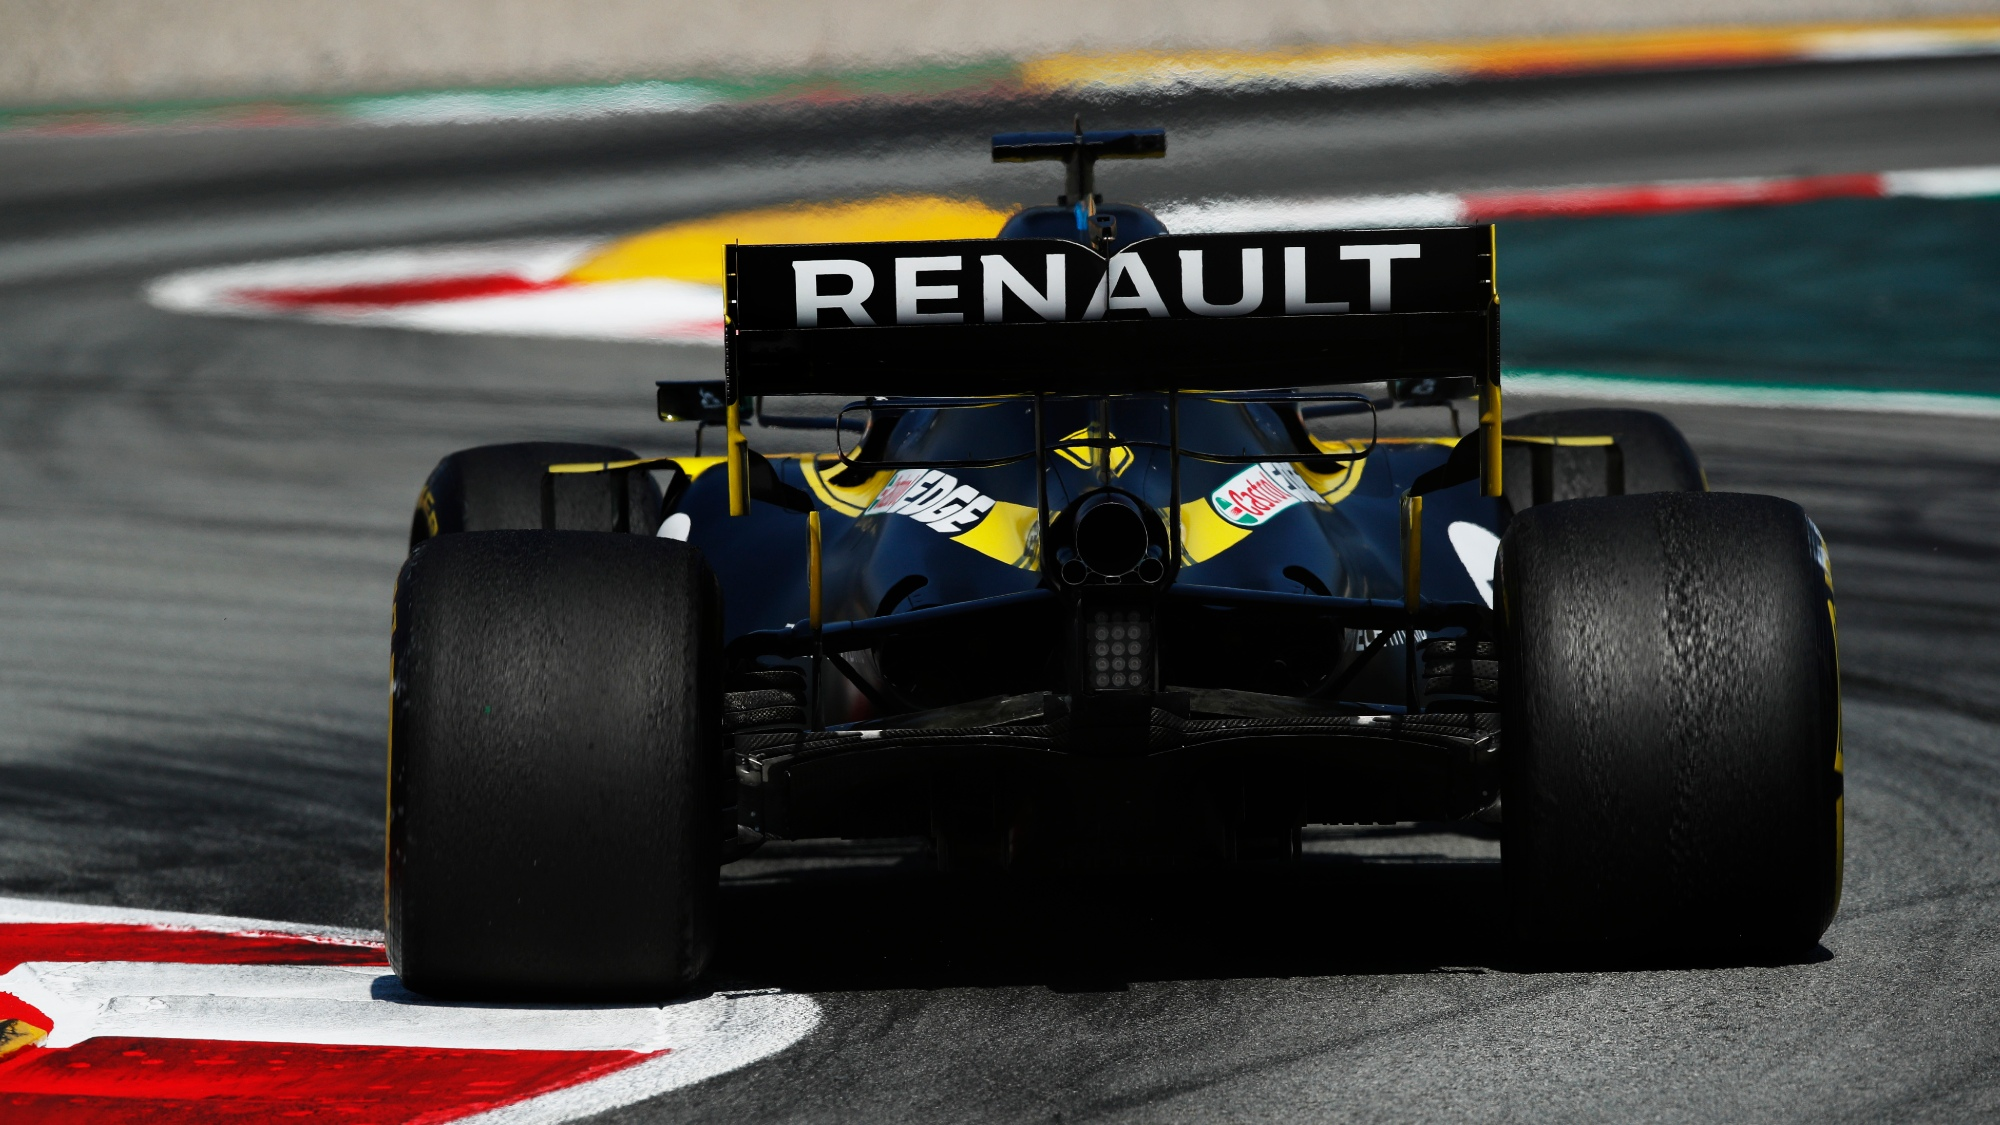 Daniel Ricciardo, 2020 Spanish GP